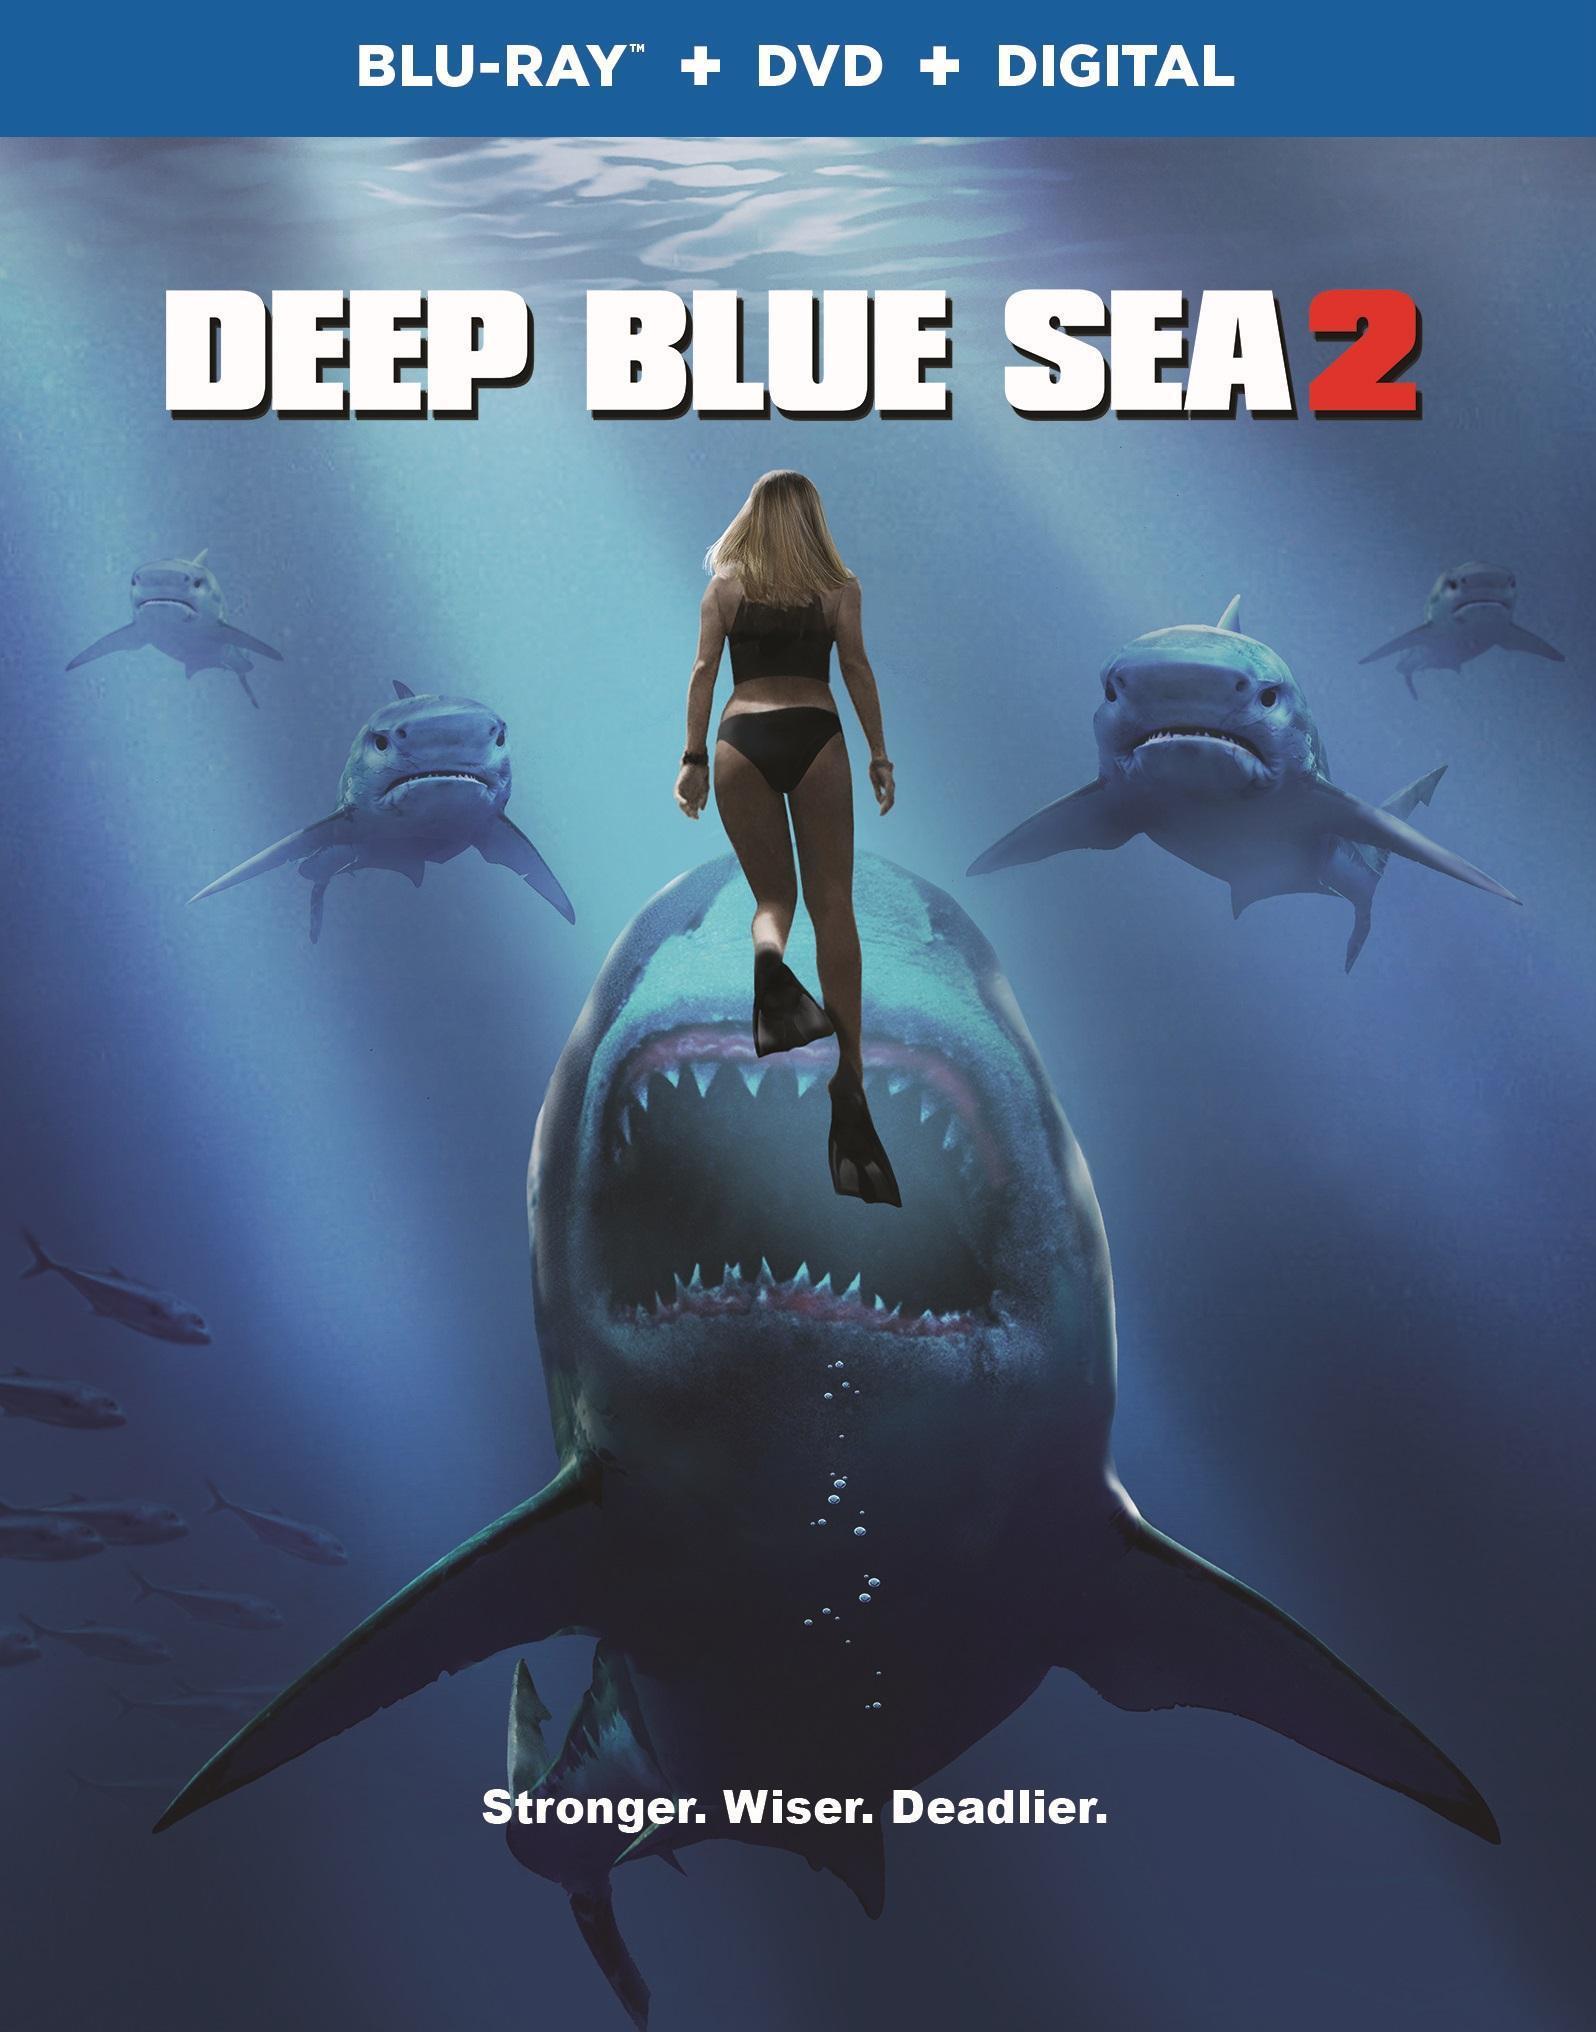 Deep Blue Sea 2 (2018) Blu-ray